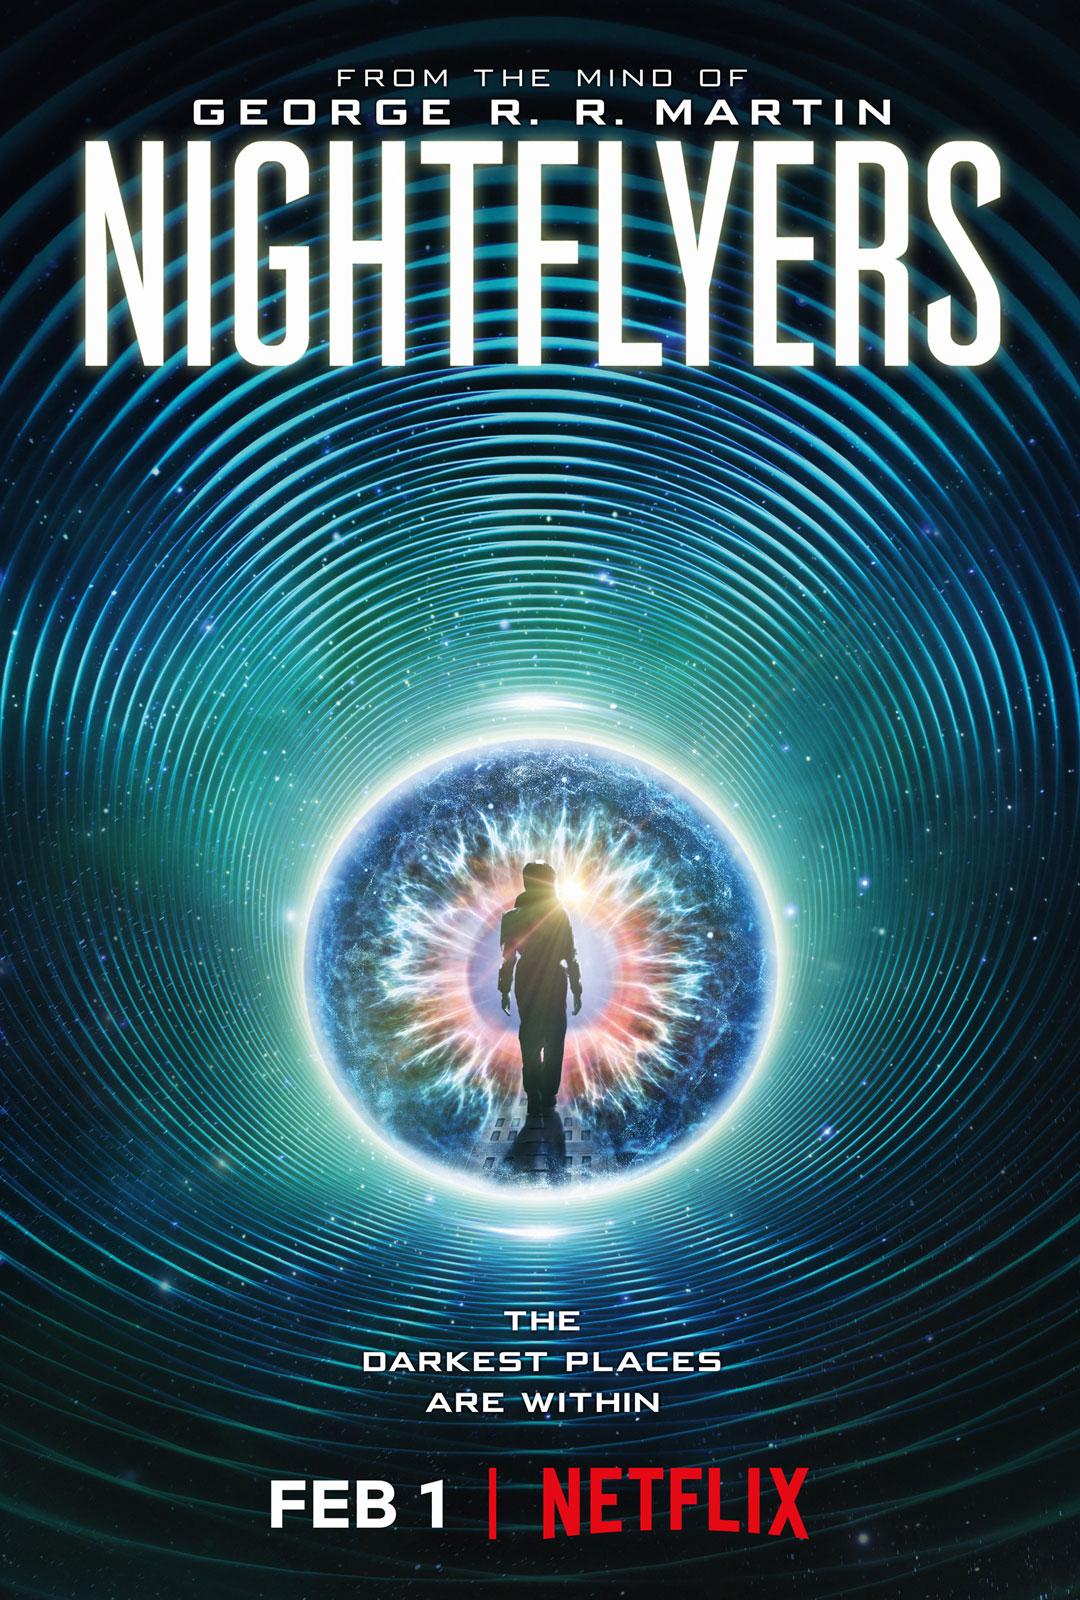 40 - Nightflyers